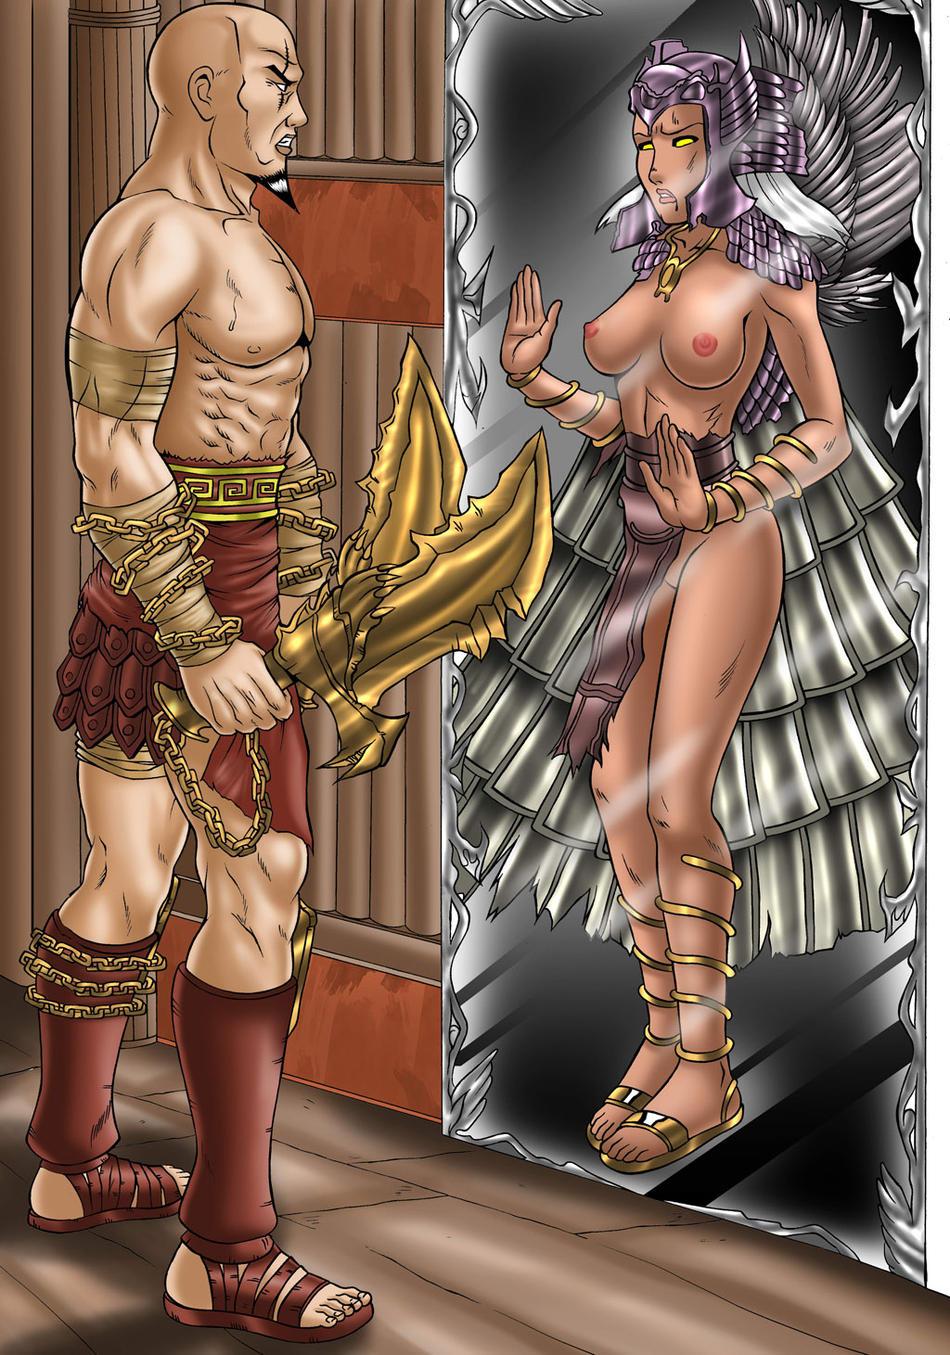 boy war god gif of Tentacle all the way through porn